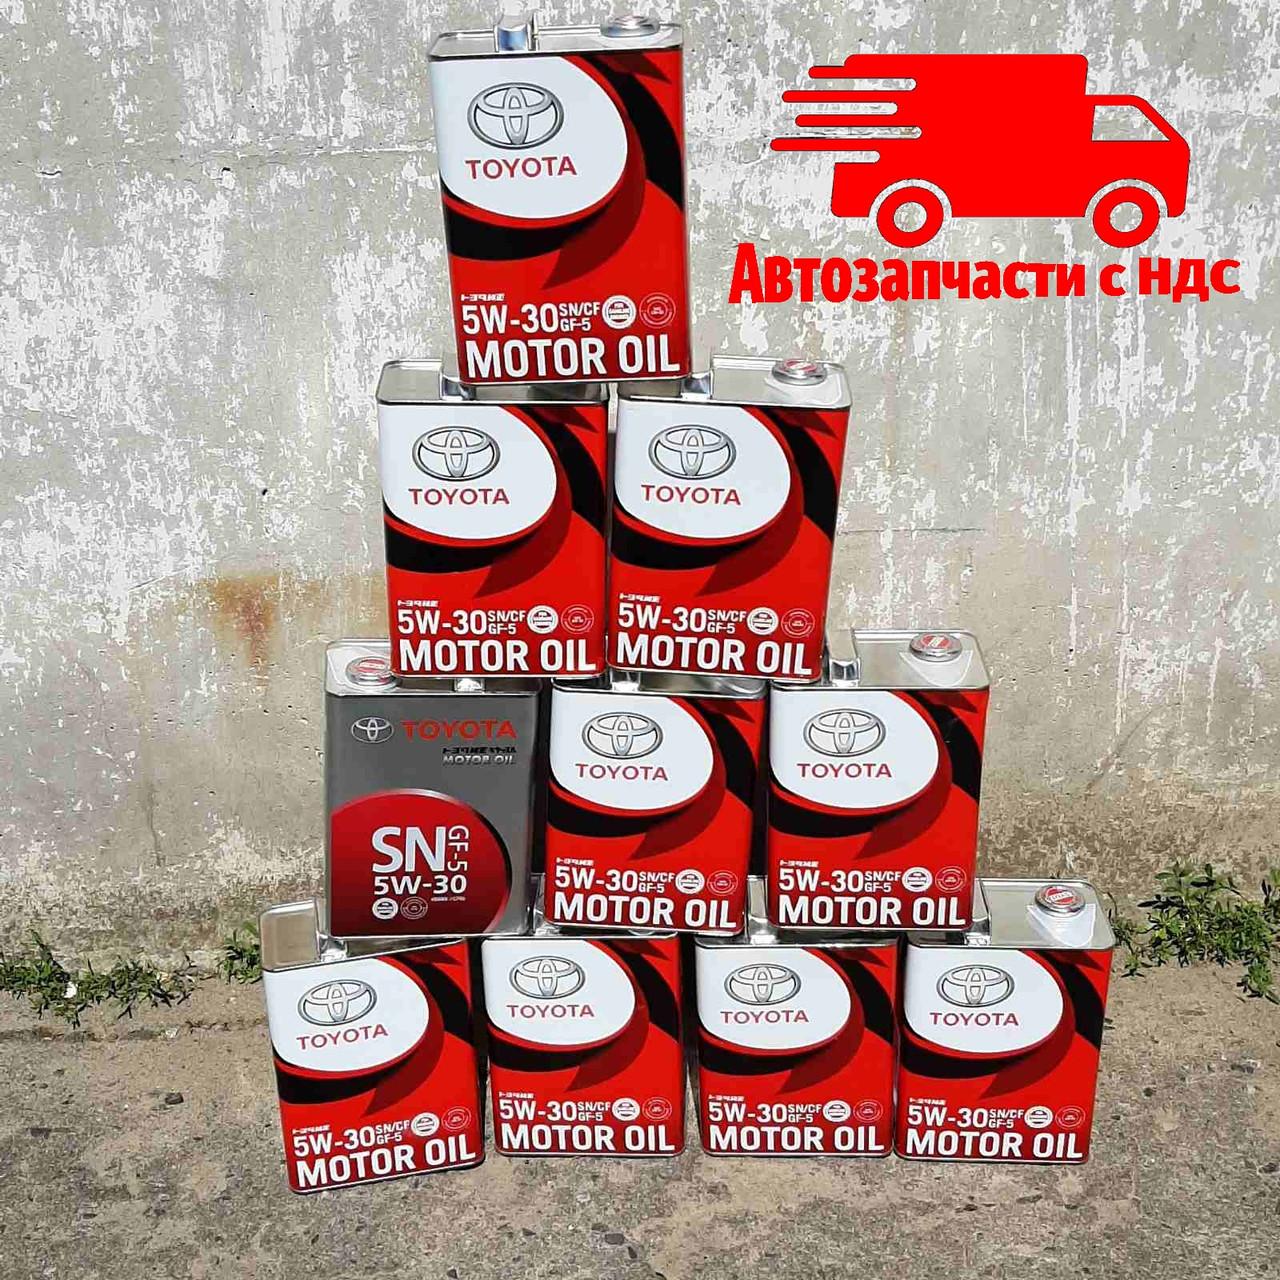 Моторное масло (оригинальное) OE OIL TOYOTA JP 5W30/4; Канистра 4 литра. Цена за 1 канистру; 08880-10705